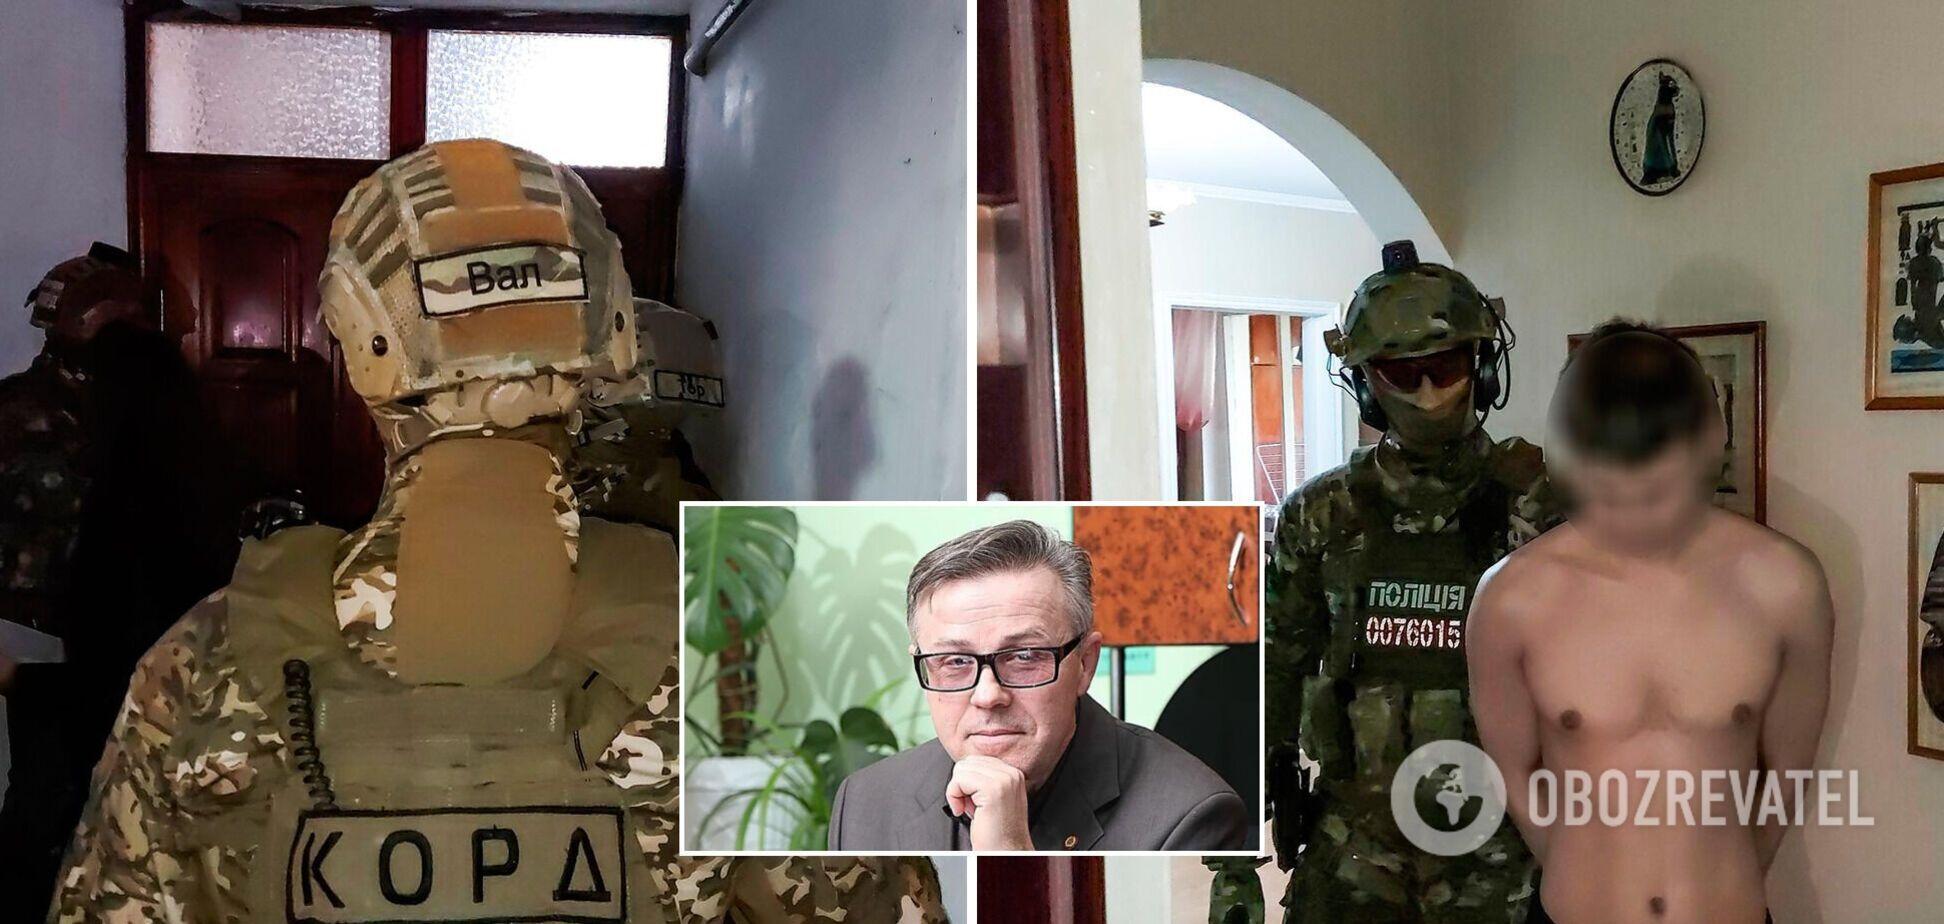 Спецназ задержал подозреваемого в убийстве известного историка в Николаеве. Фото и видео